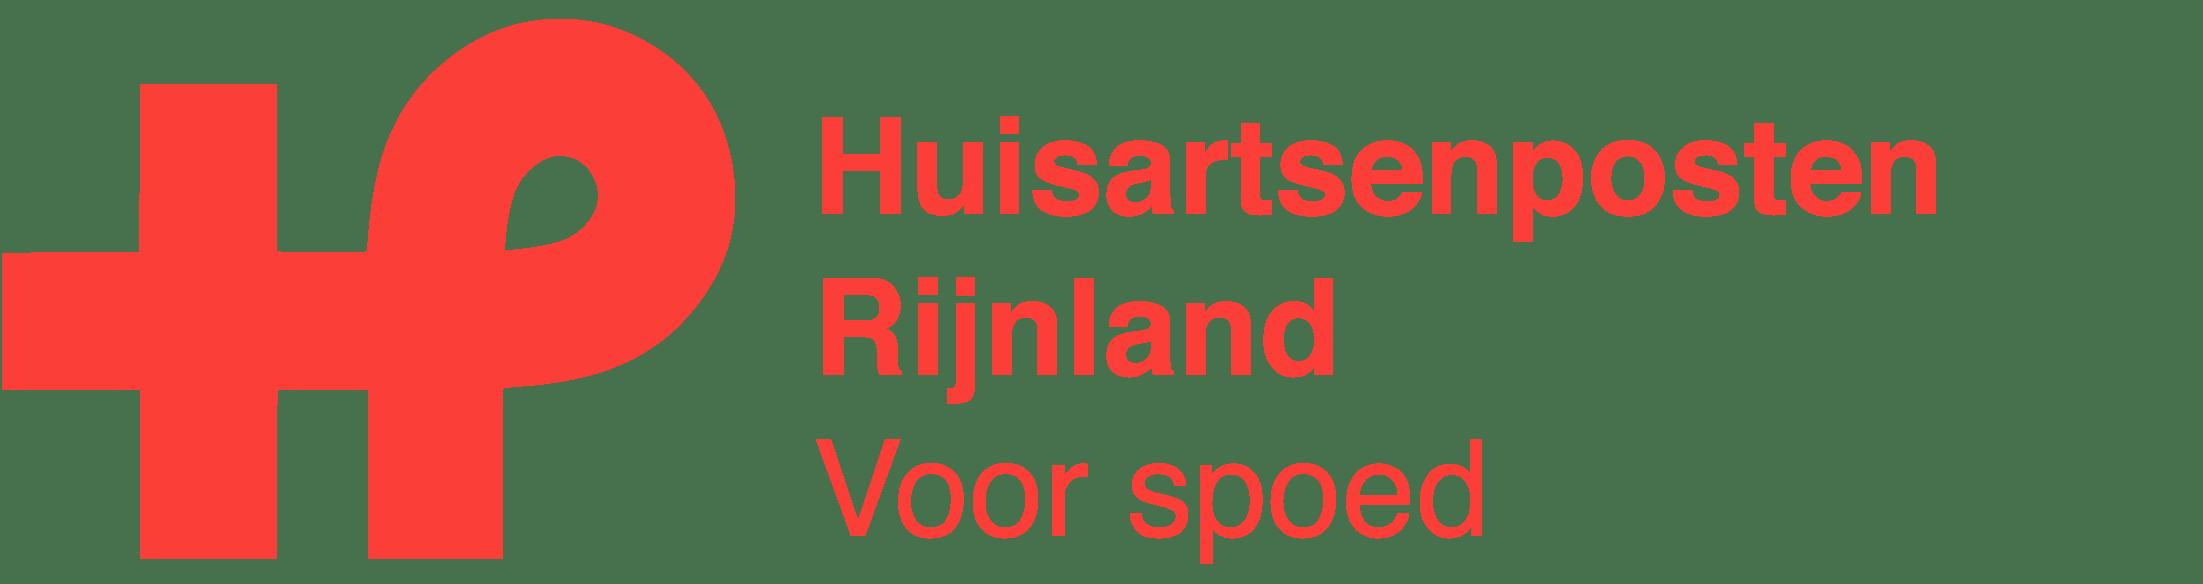 Samenwerkende Huisartsendiensten Rijnland (SHR)